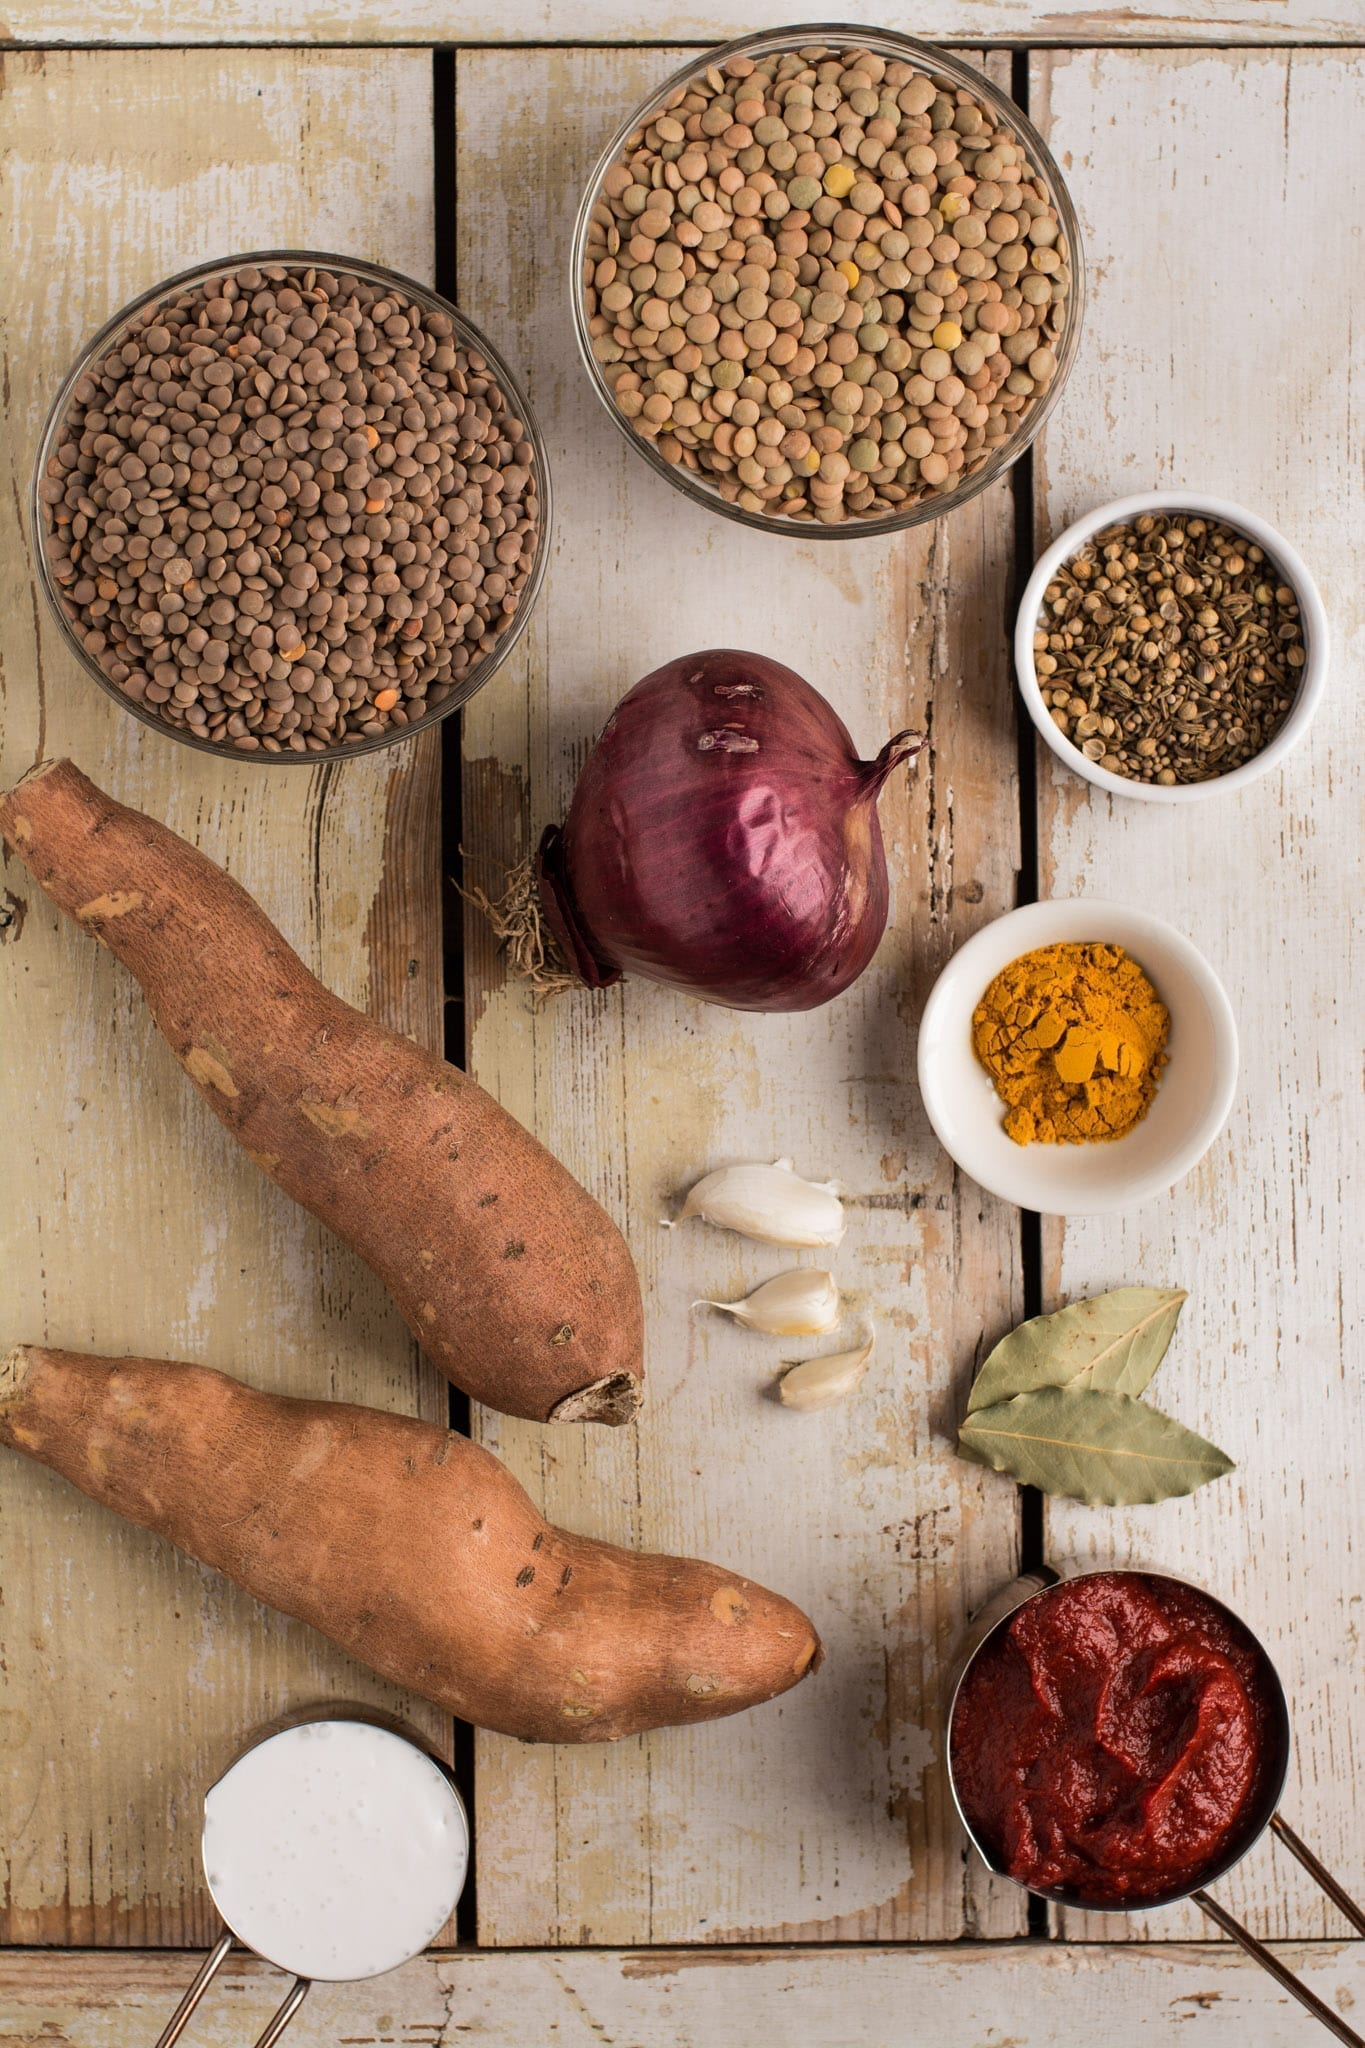 Sweet Potato Lentil Stew Ingredients